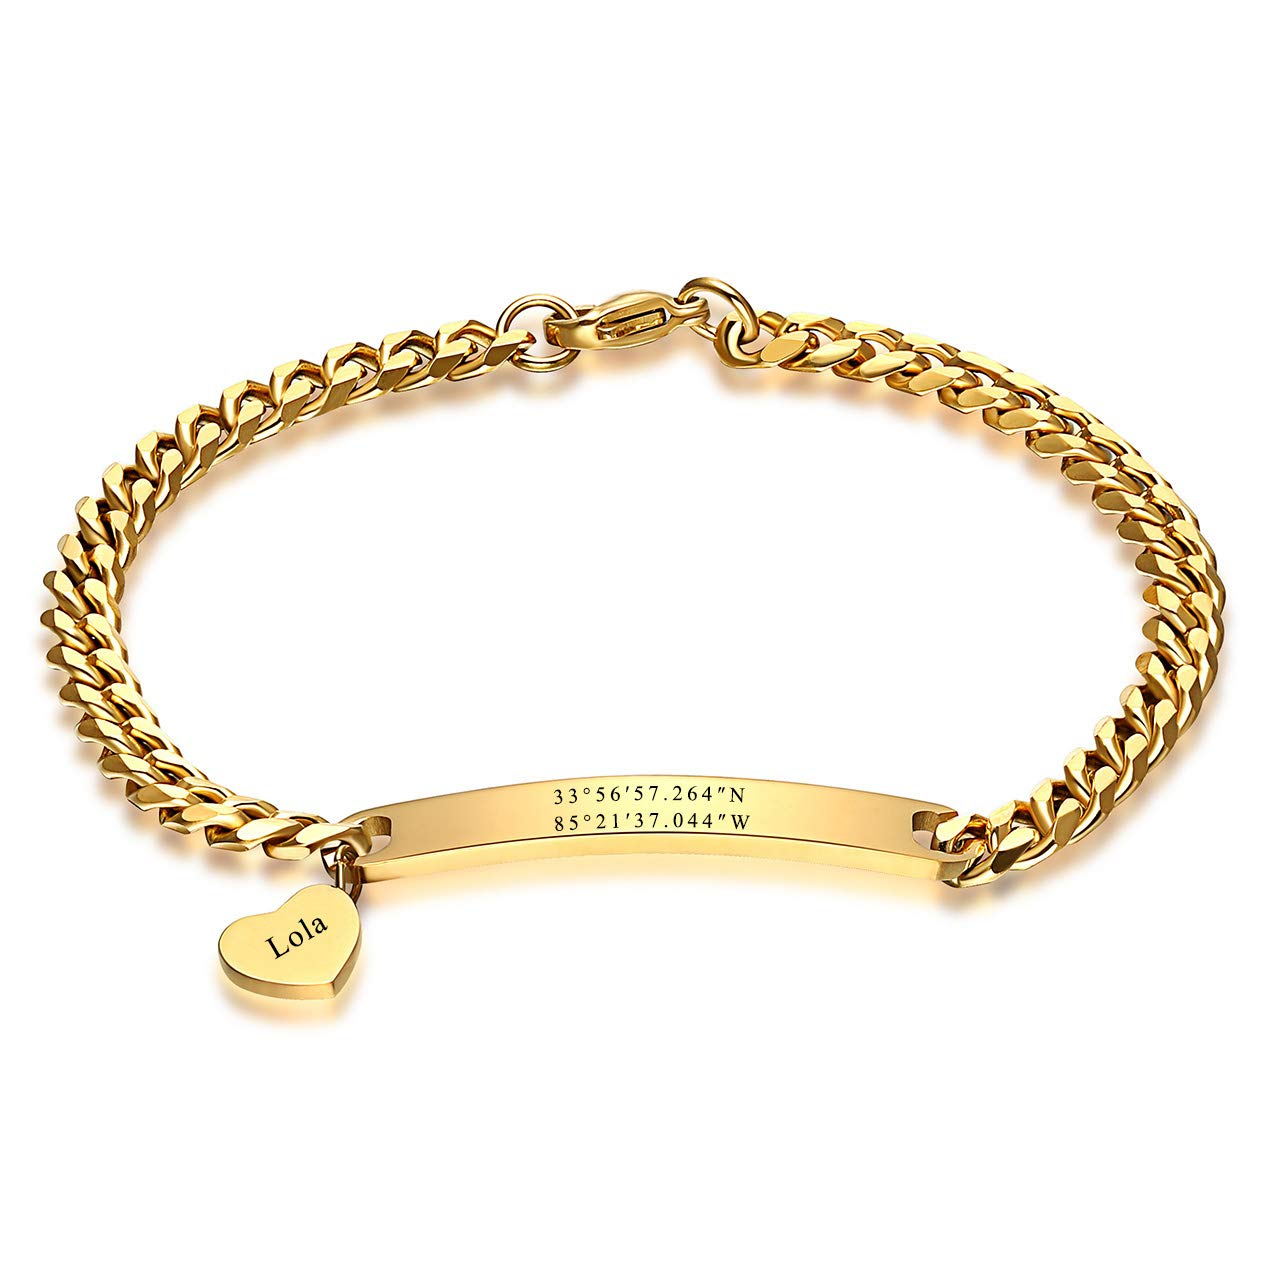 JOVIVI Personalized Customized Couples Bracelets Engraved Name Men Women Stainless Steel Thin Heart Link ID Bracelet Adjustable,Custom Coordinate Name Bar Bracelet